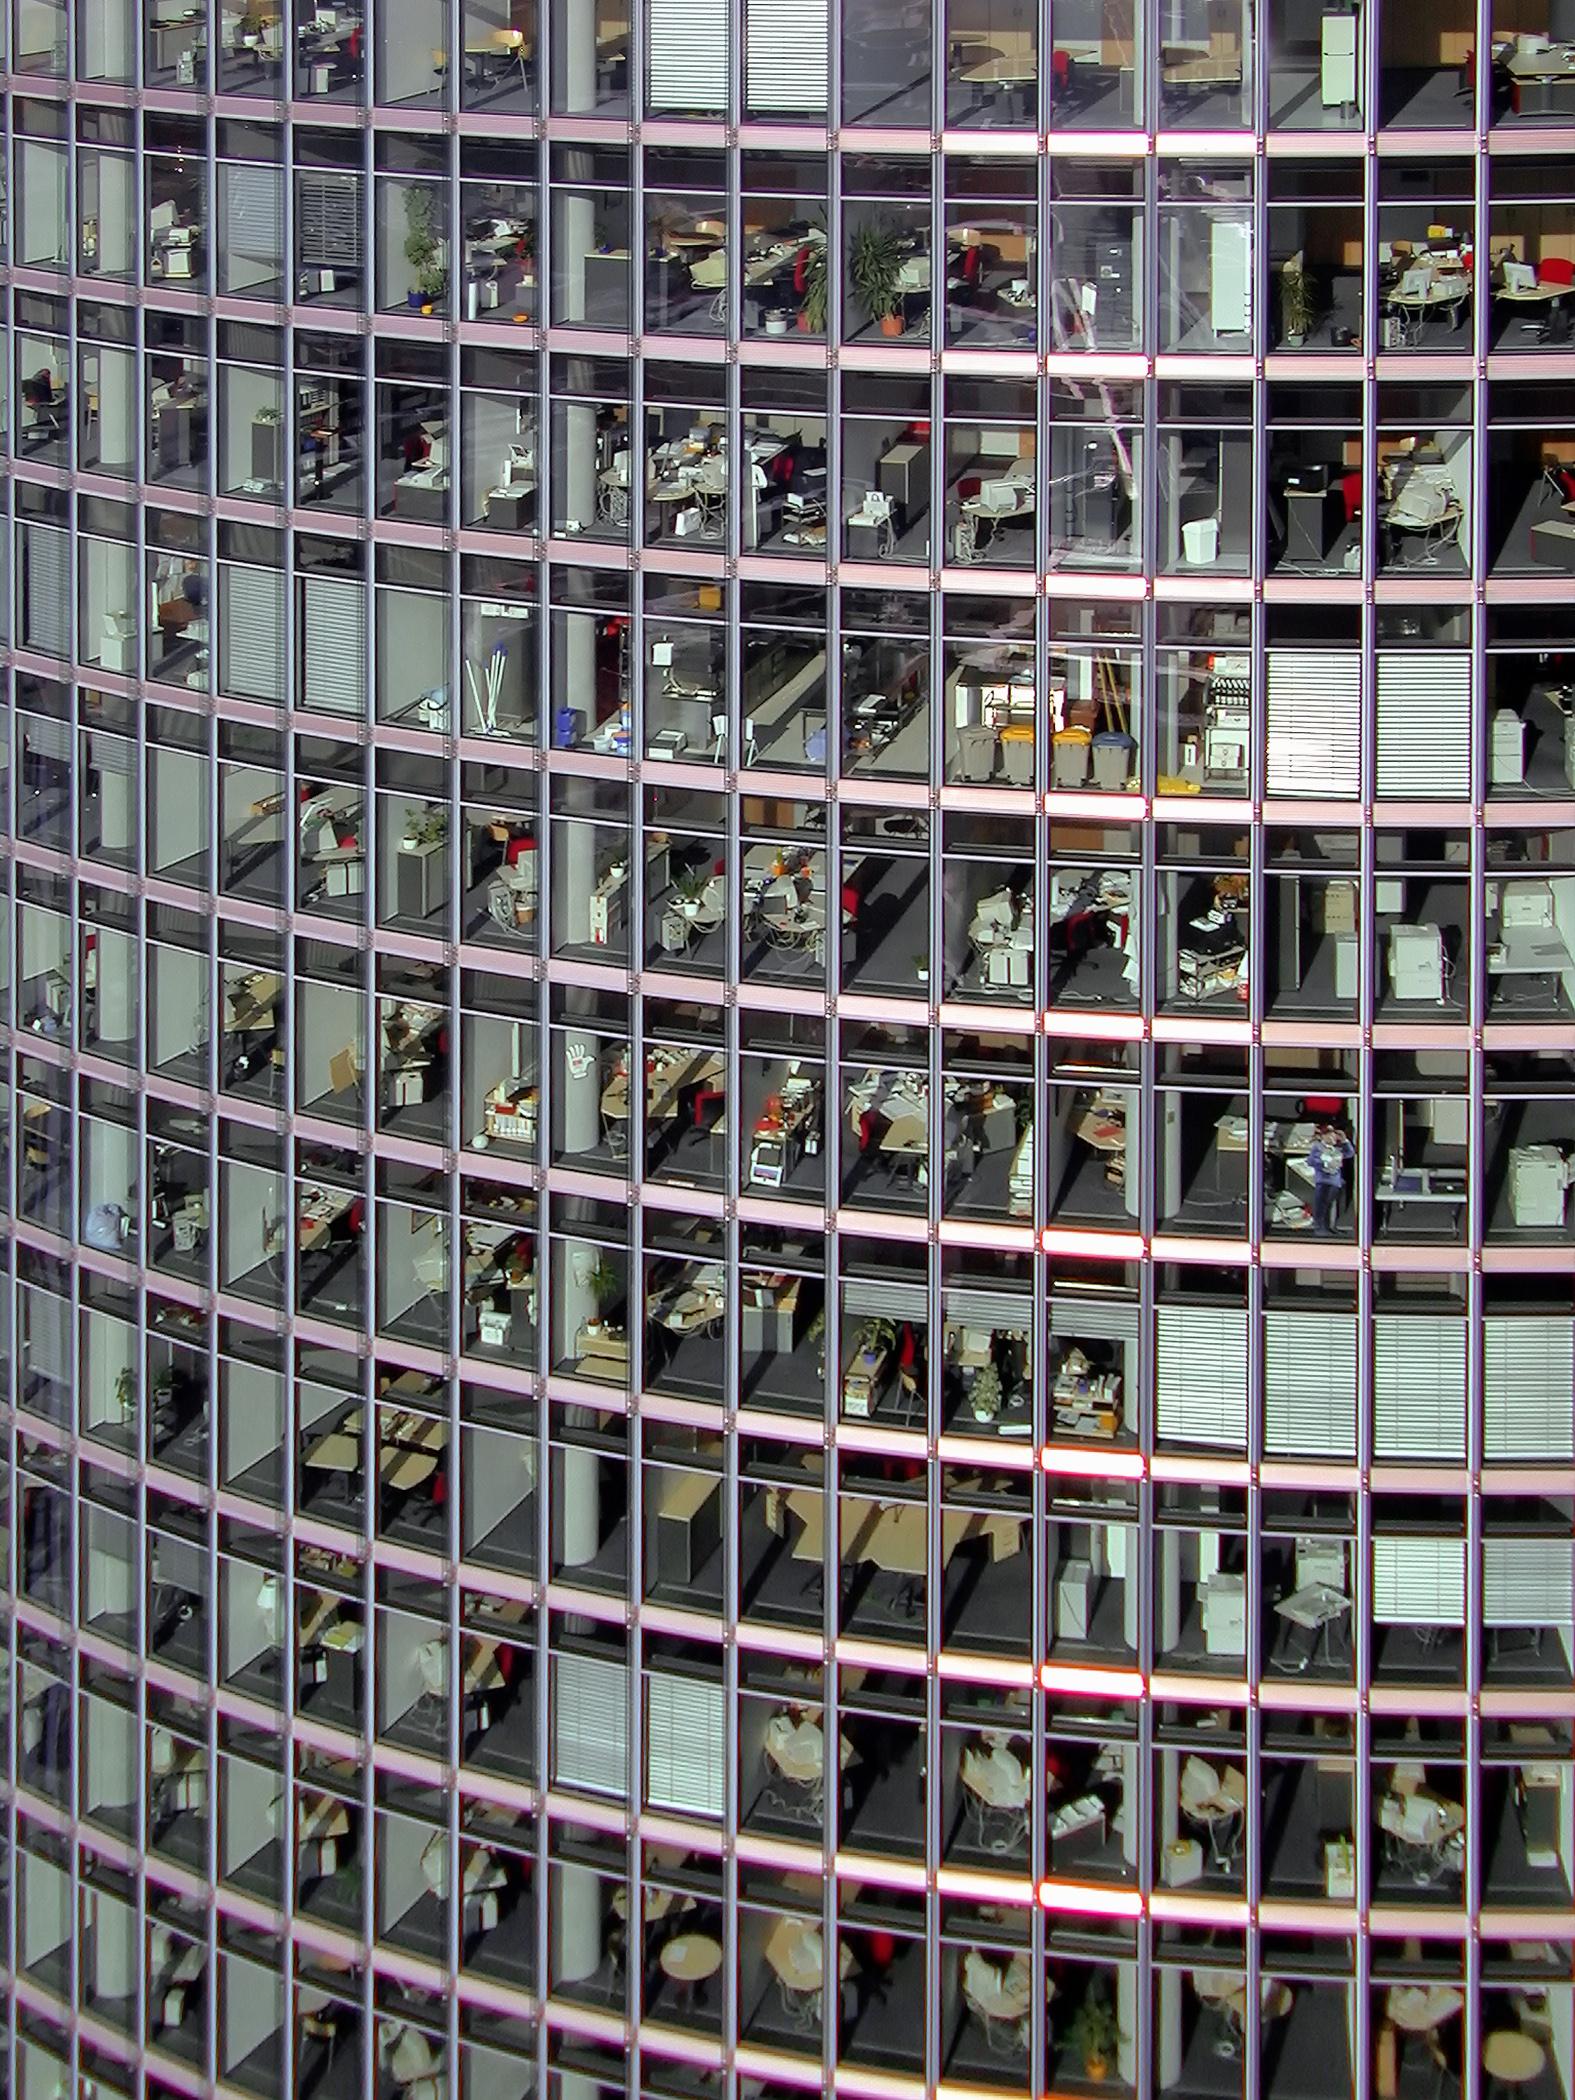 Berlin Office workers.jpg